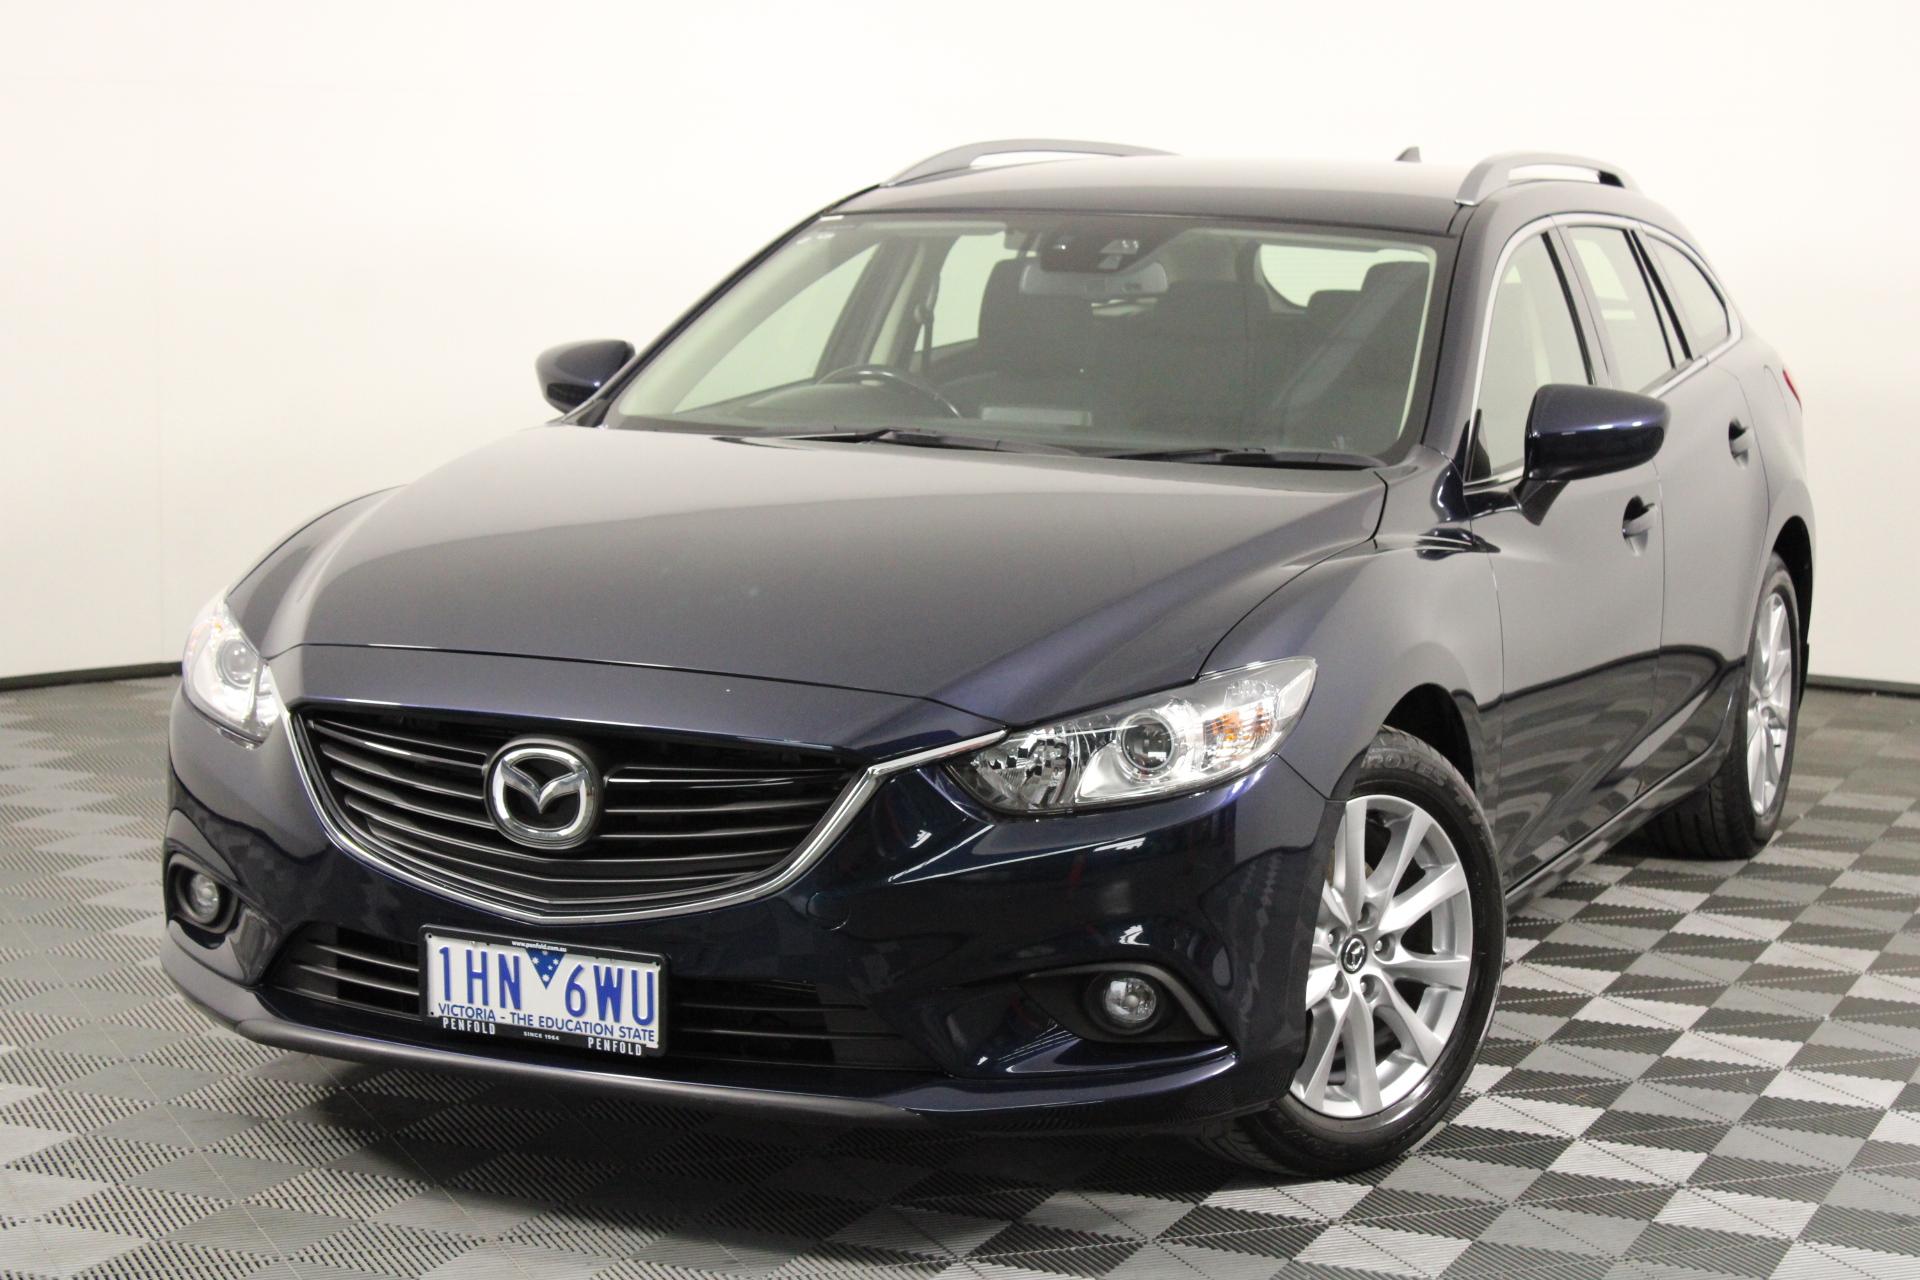 2016 Mazda 6 Sport GJ Automatic Wagon (EX GOV)